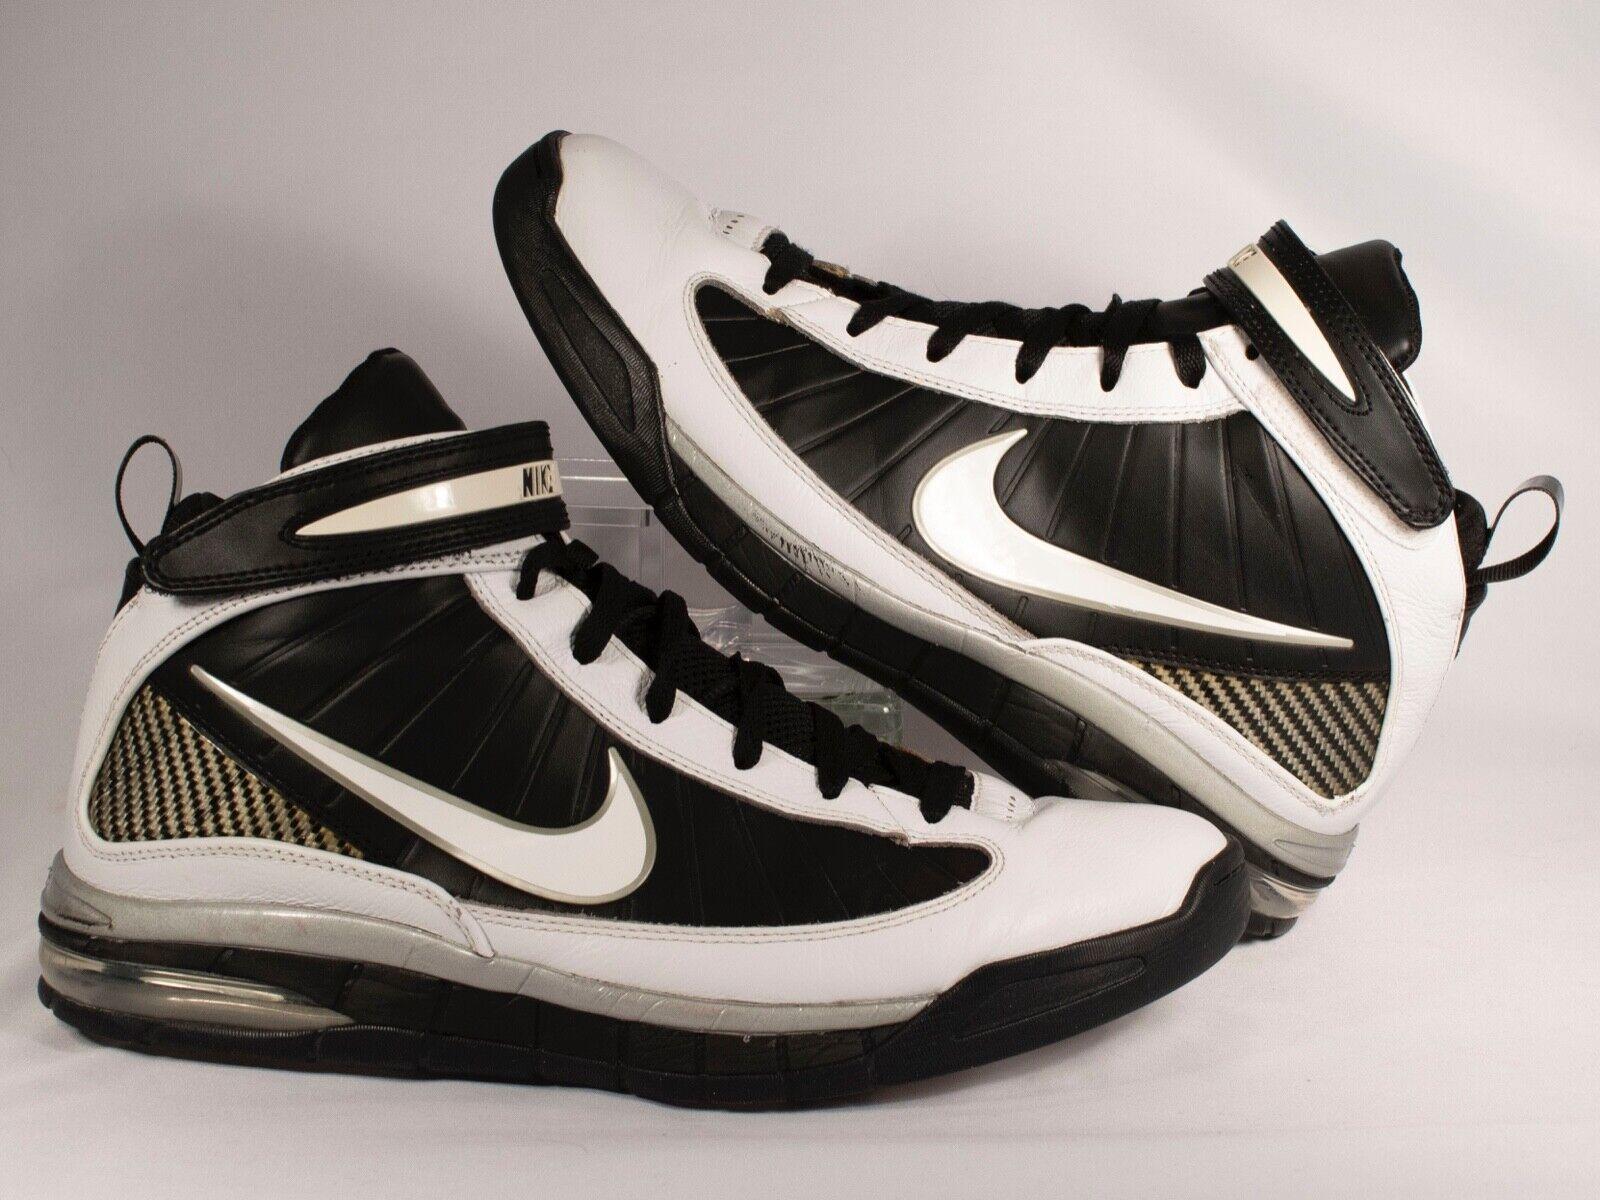 Nike Air Max Rise US Men's size 11 White Black 375659-100 year 2009